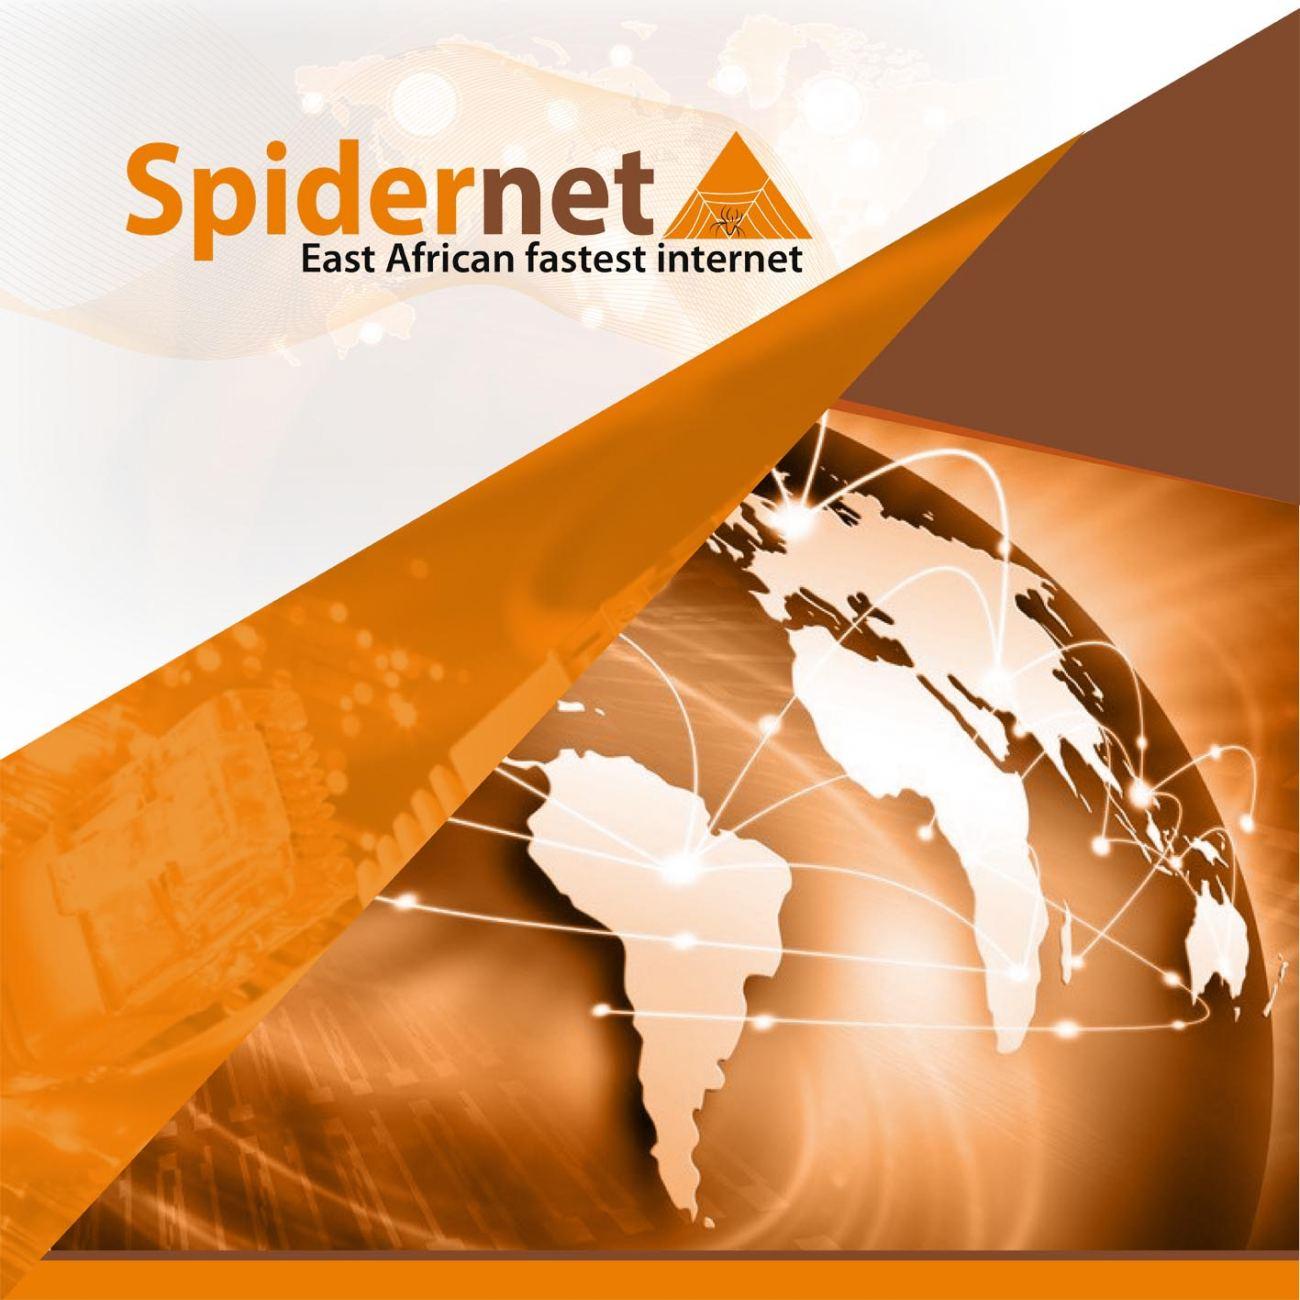 http://www.iwacu-burundi.org/wp-content/uploads/2017/02/SPIDERNET-13FEV-.jpg